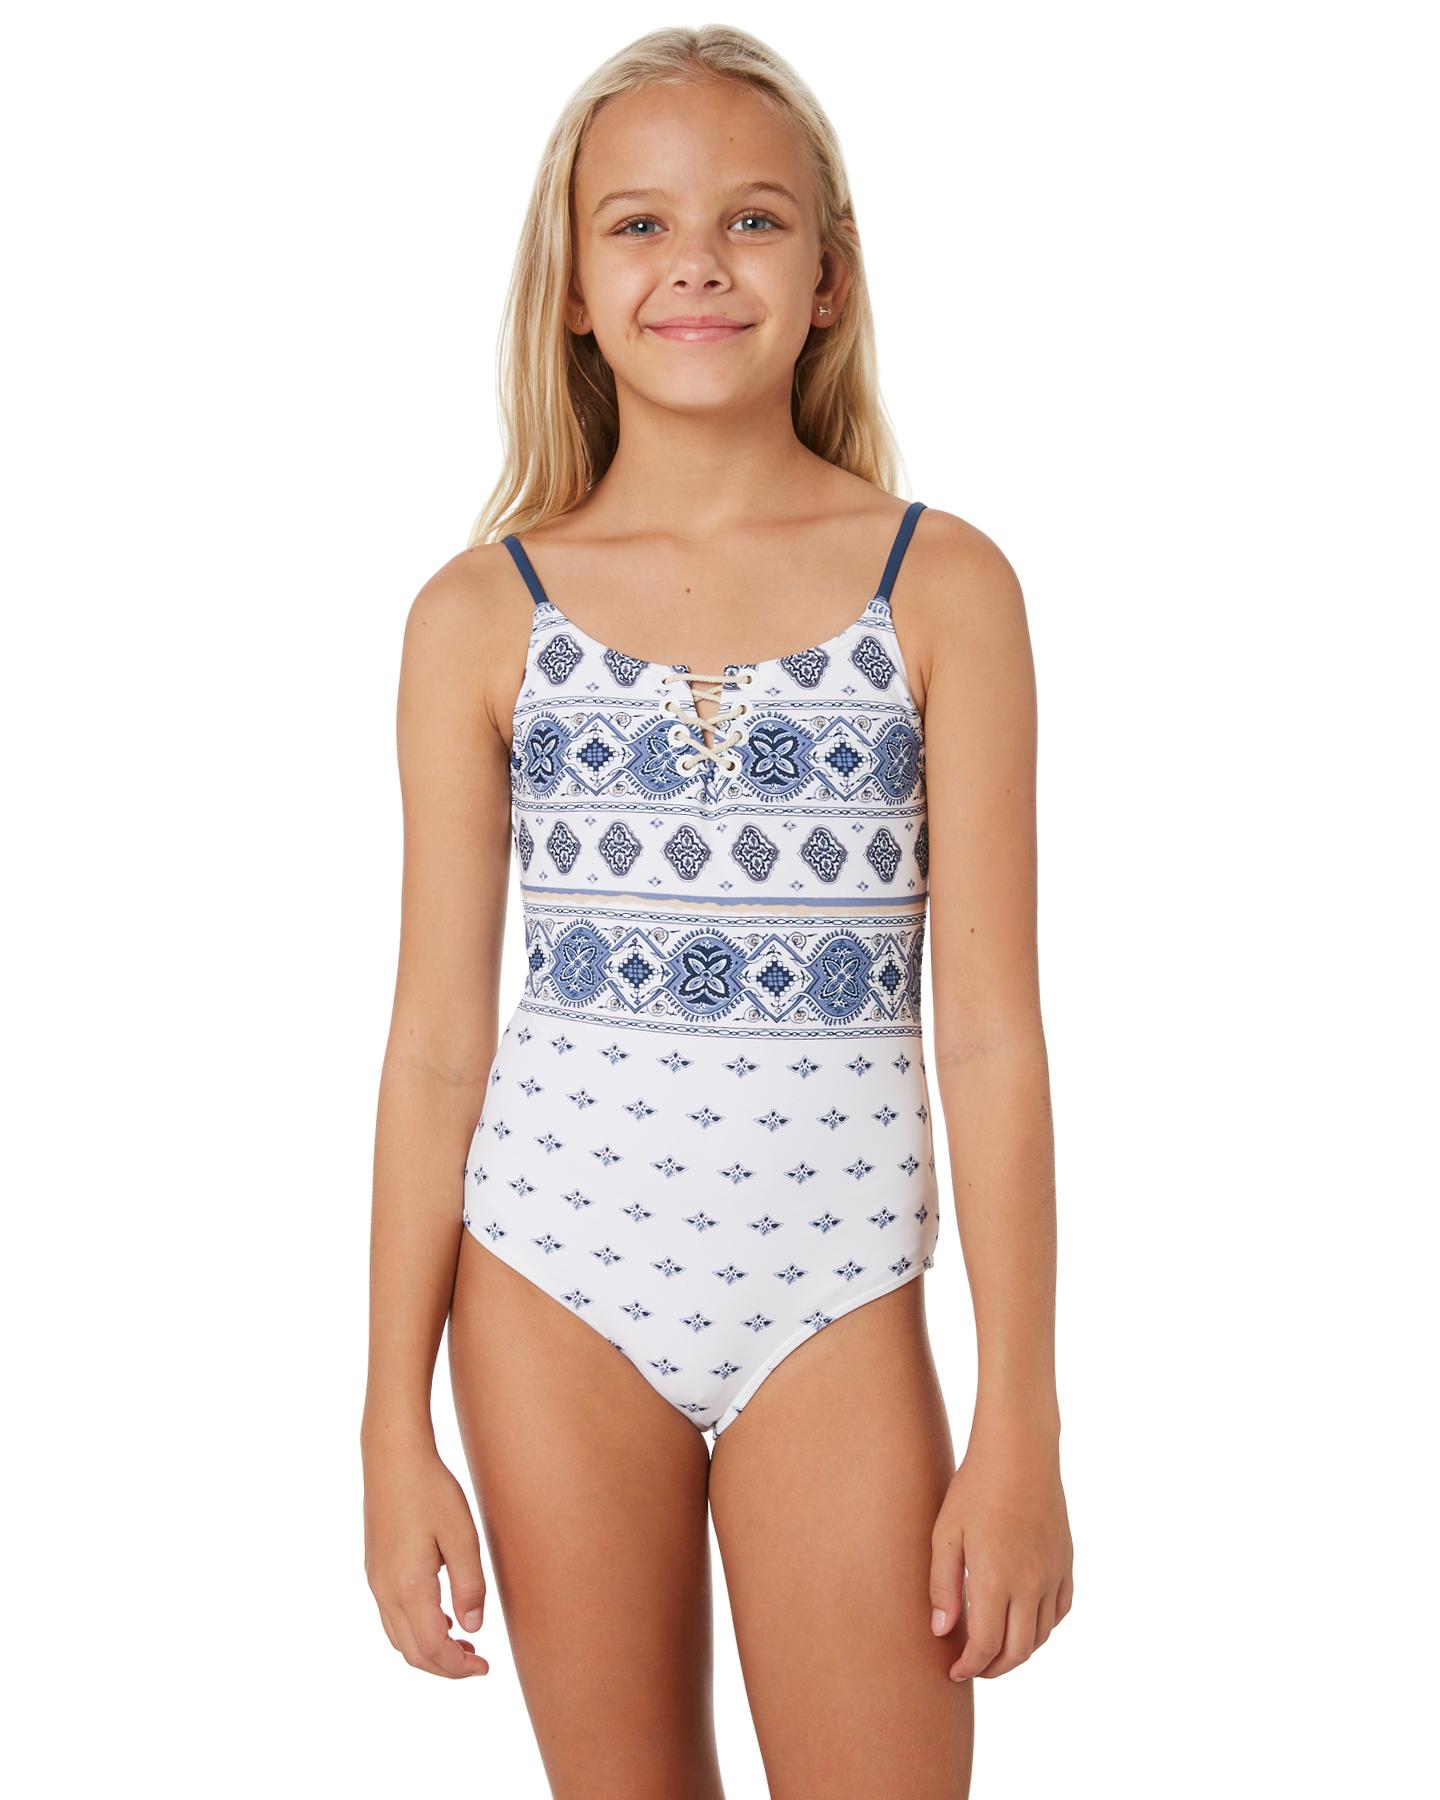 754c8cc0d2 Rip Curl Girls Port Villa One Piece – Teens White